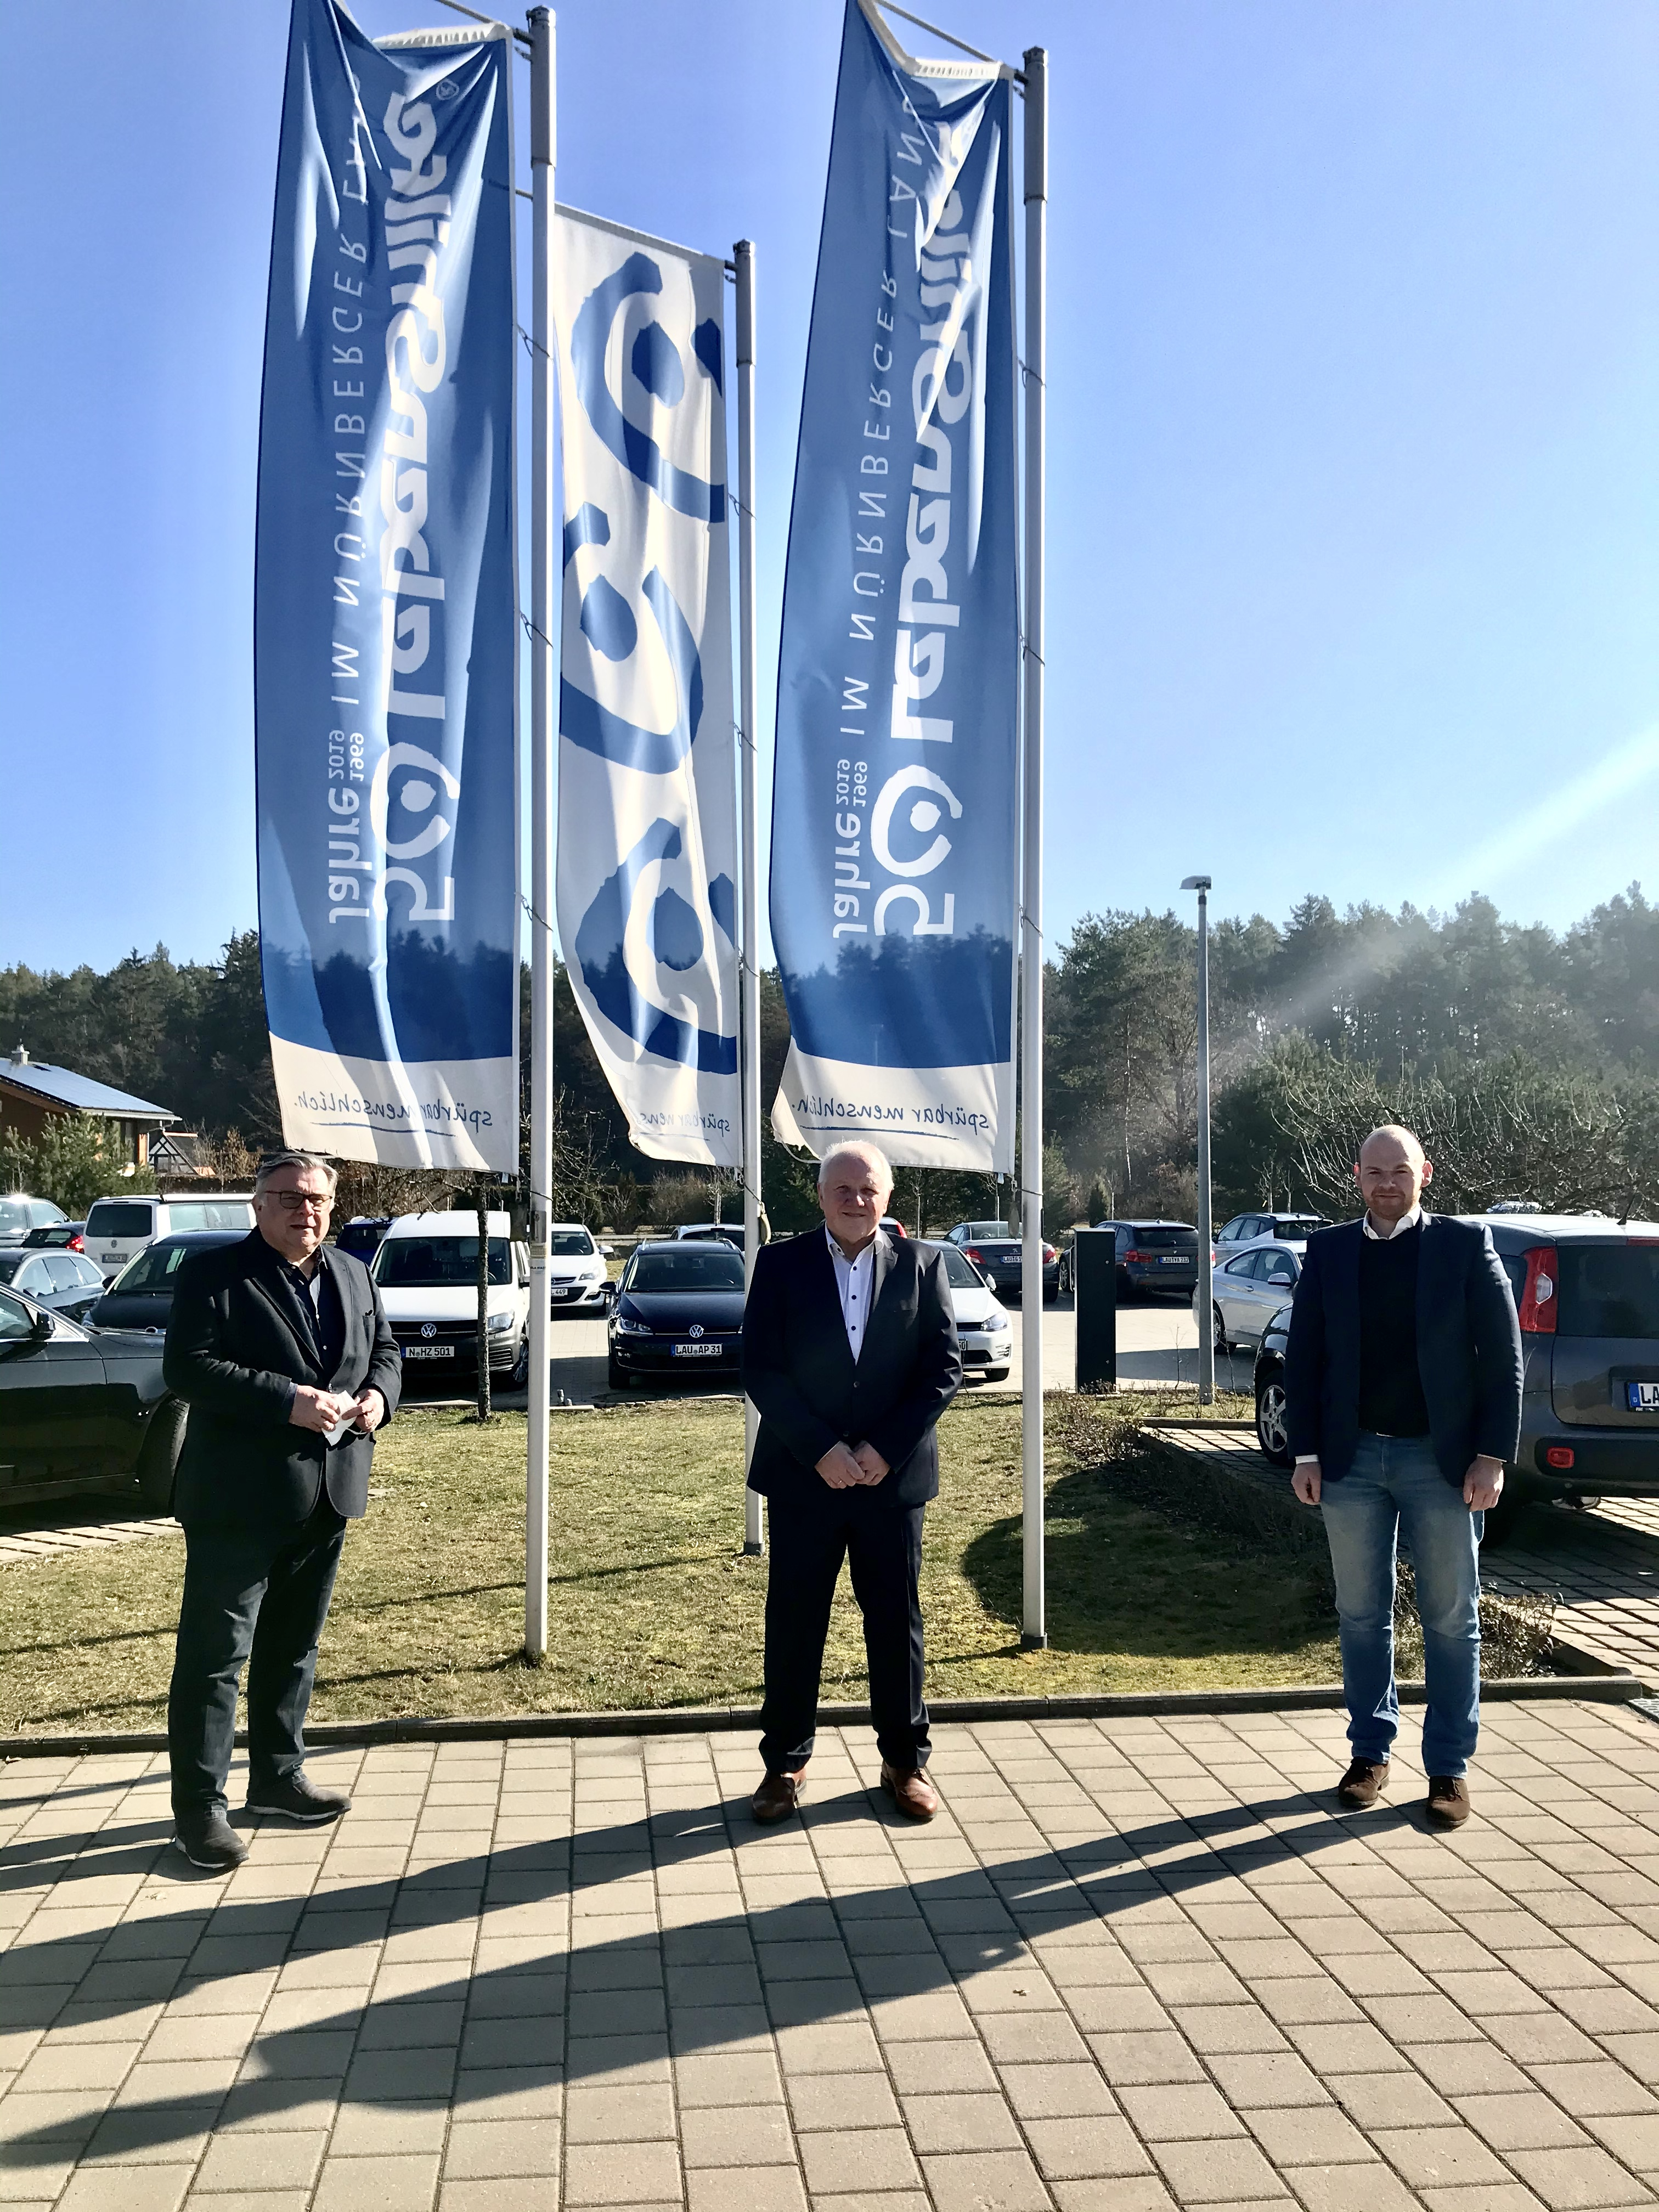 Helmut Loos, Unternehmer aus Ottensoos, ist kooptiertes Vorstandsmitglied. v. l. John, Loos, Kummarnitzky